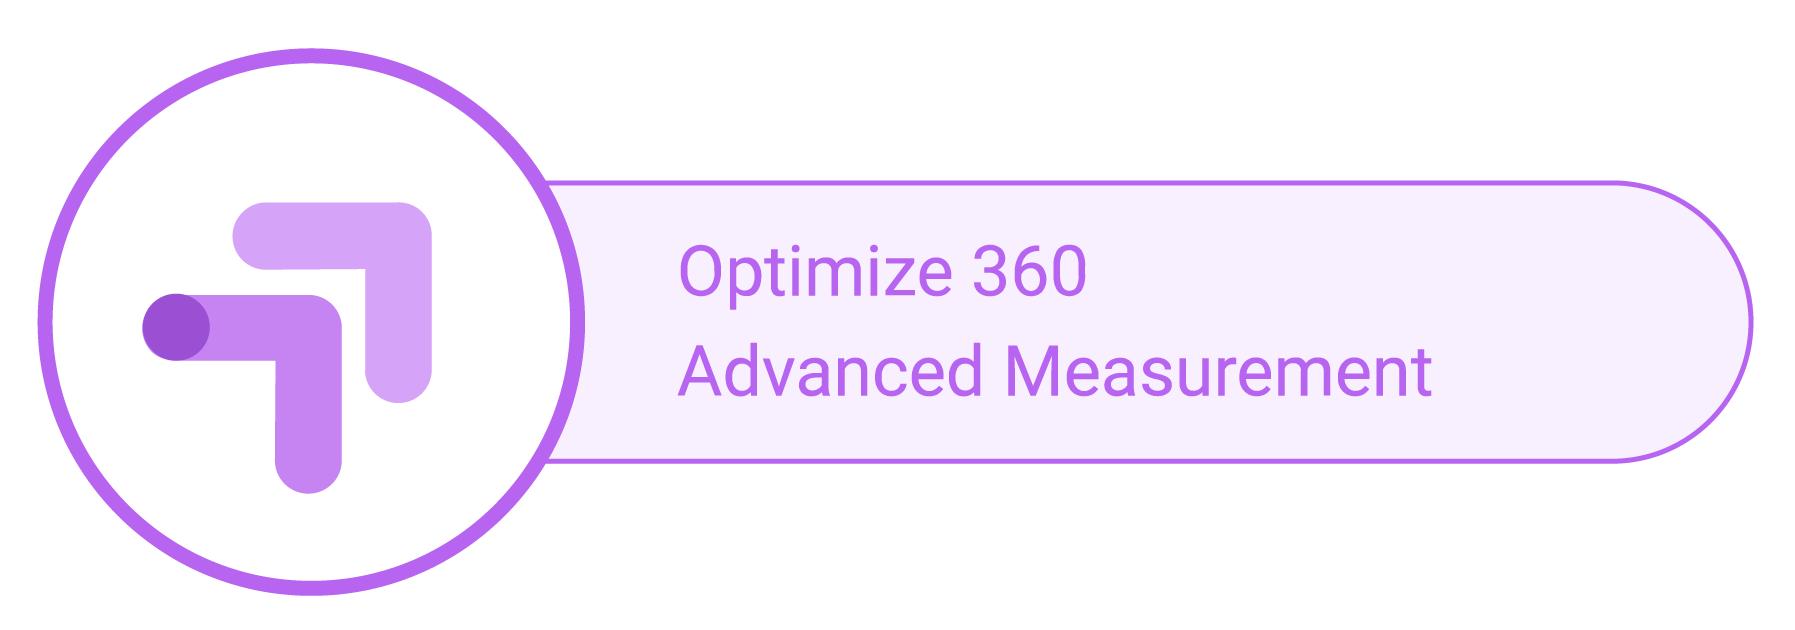 Optimize 360